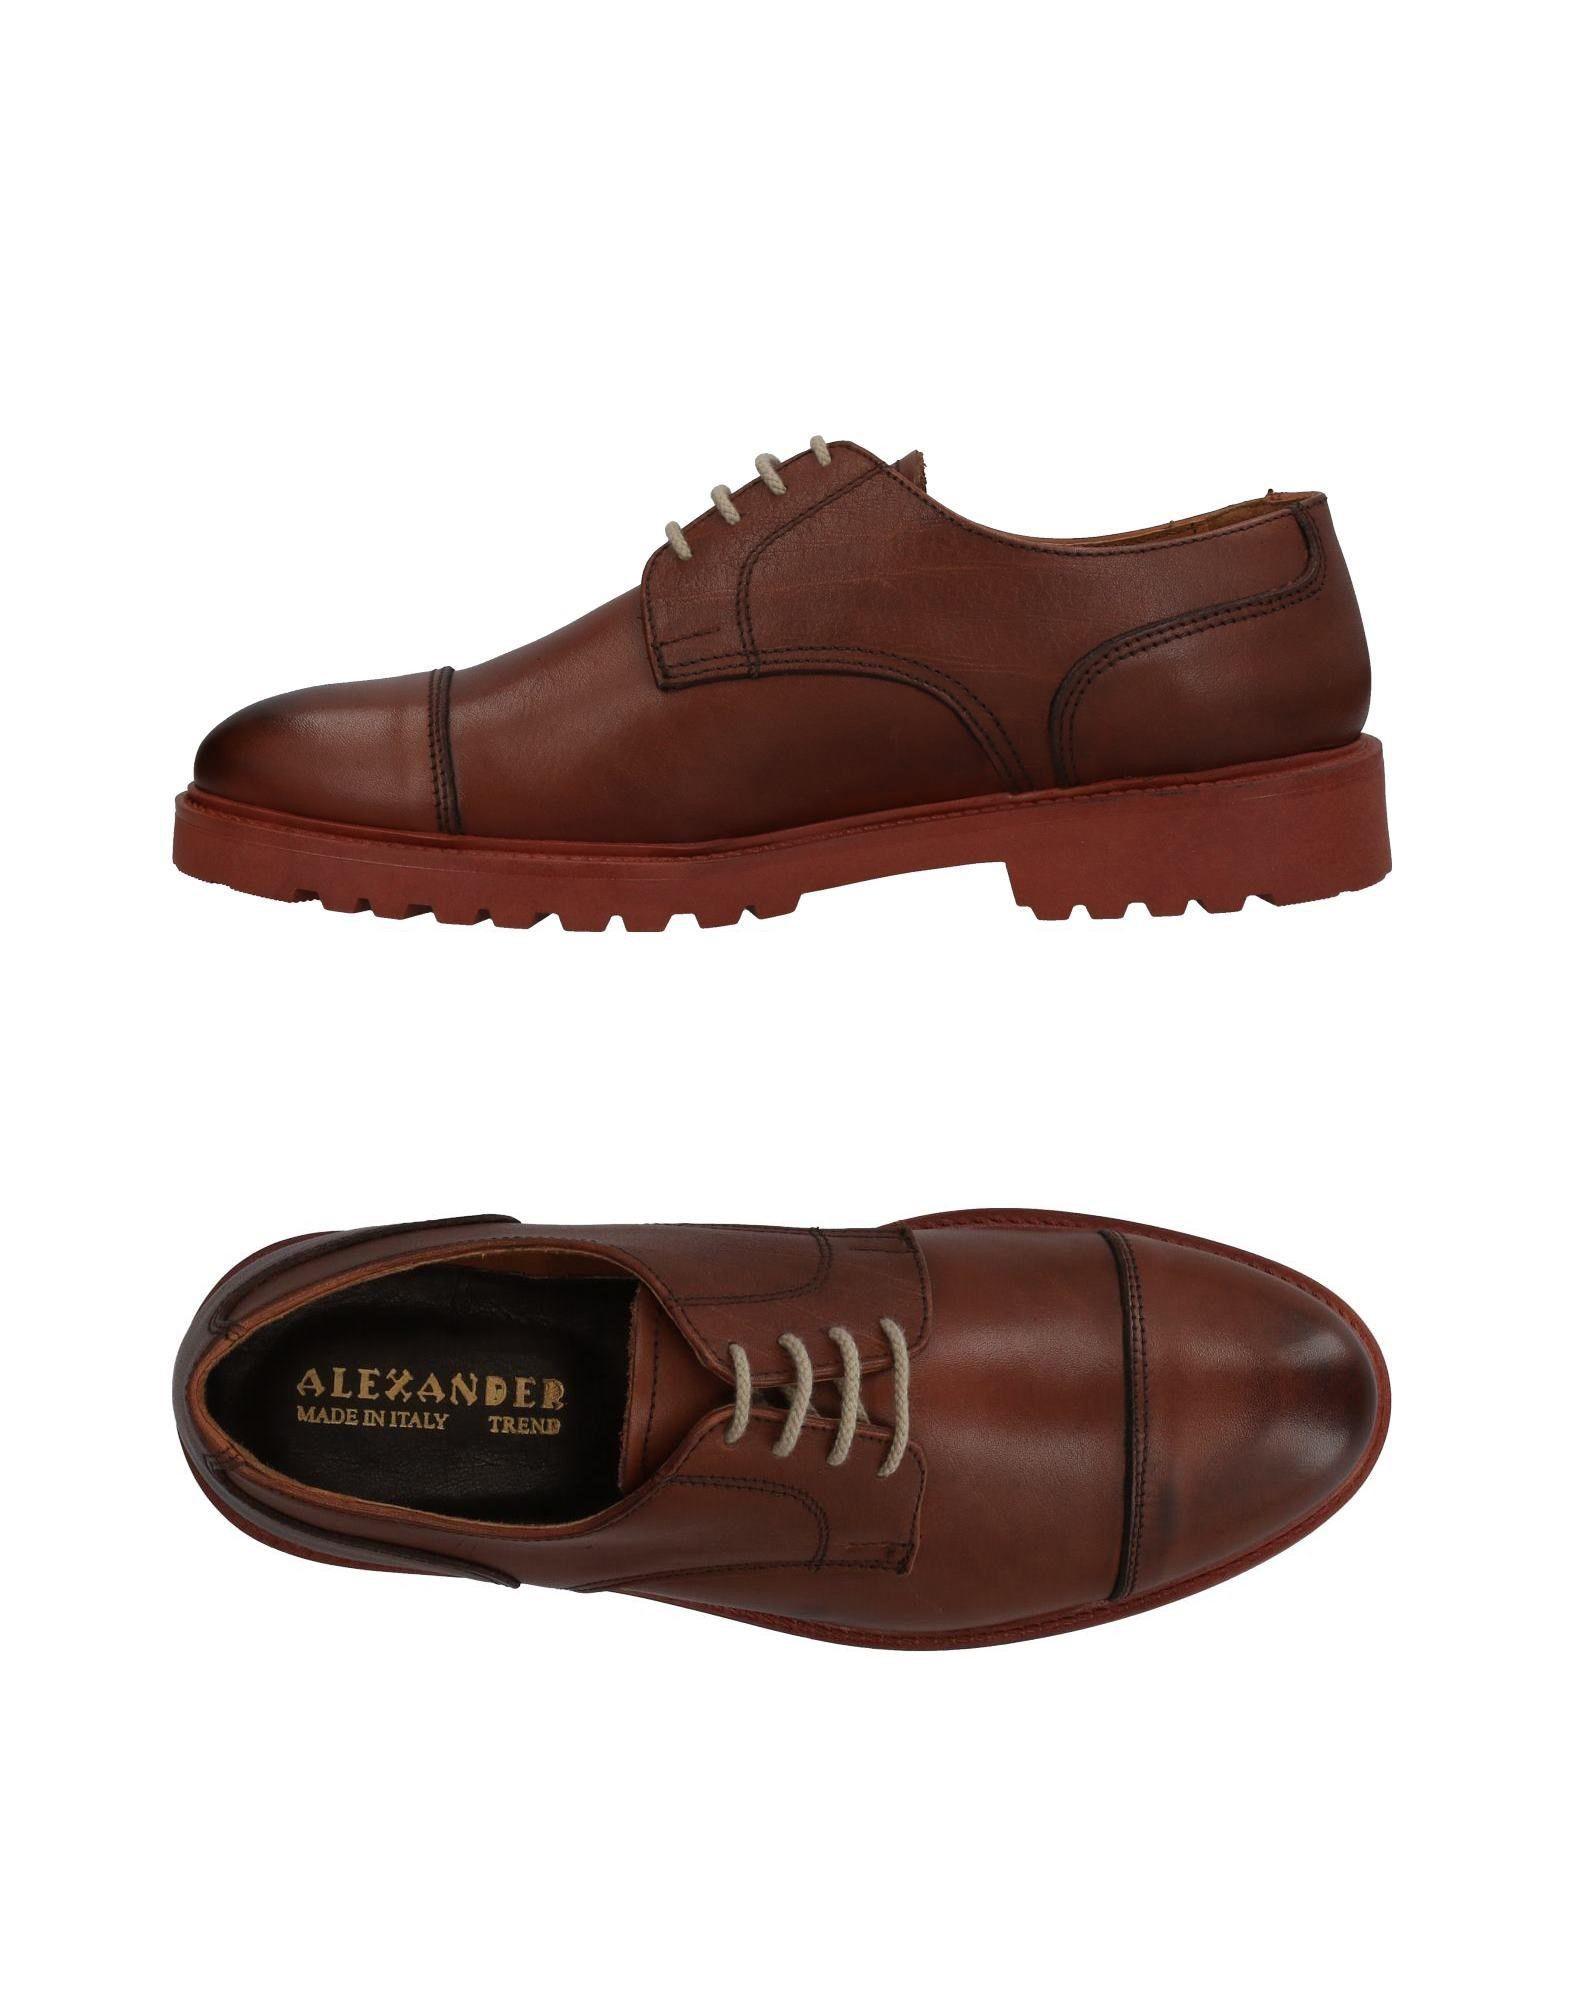 ALEXANDER TREND Обувь на шнурках alexander osterwalder trend driven innovation beat accelerating customer expectations